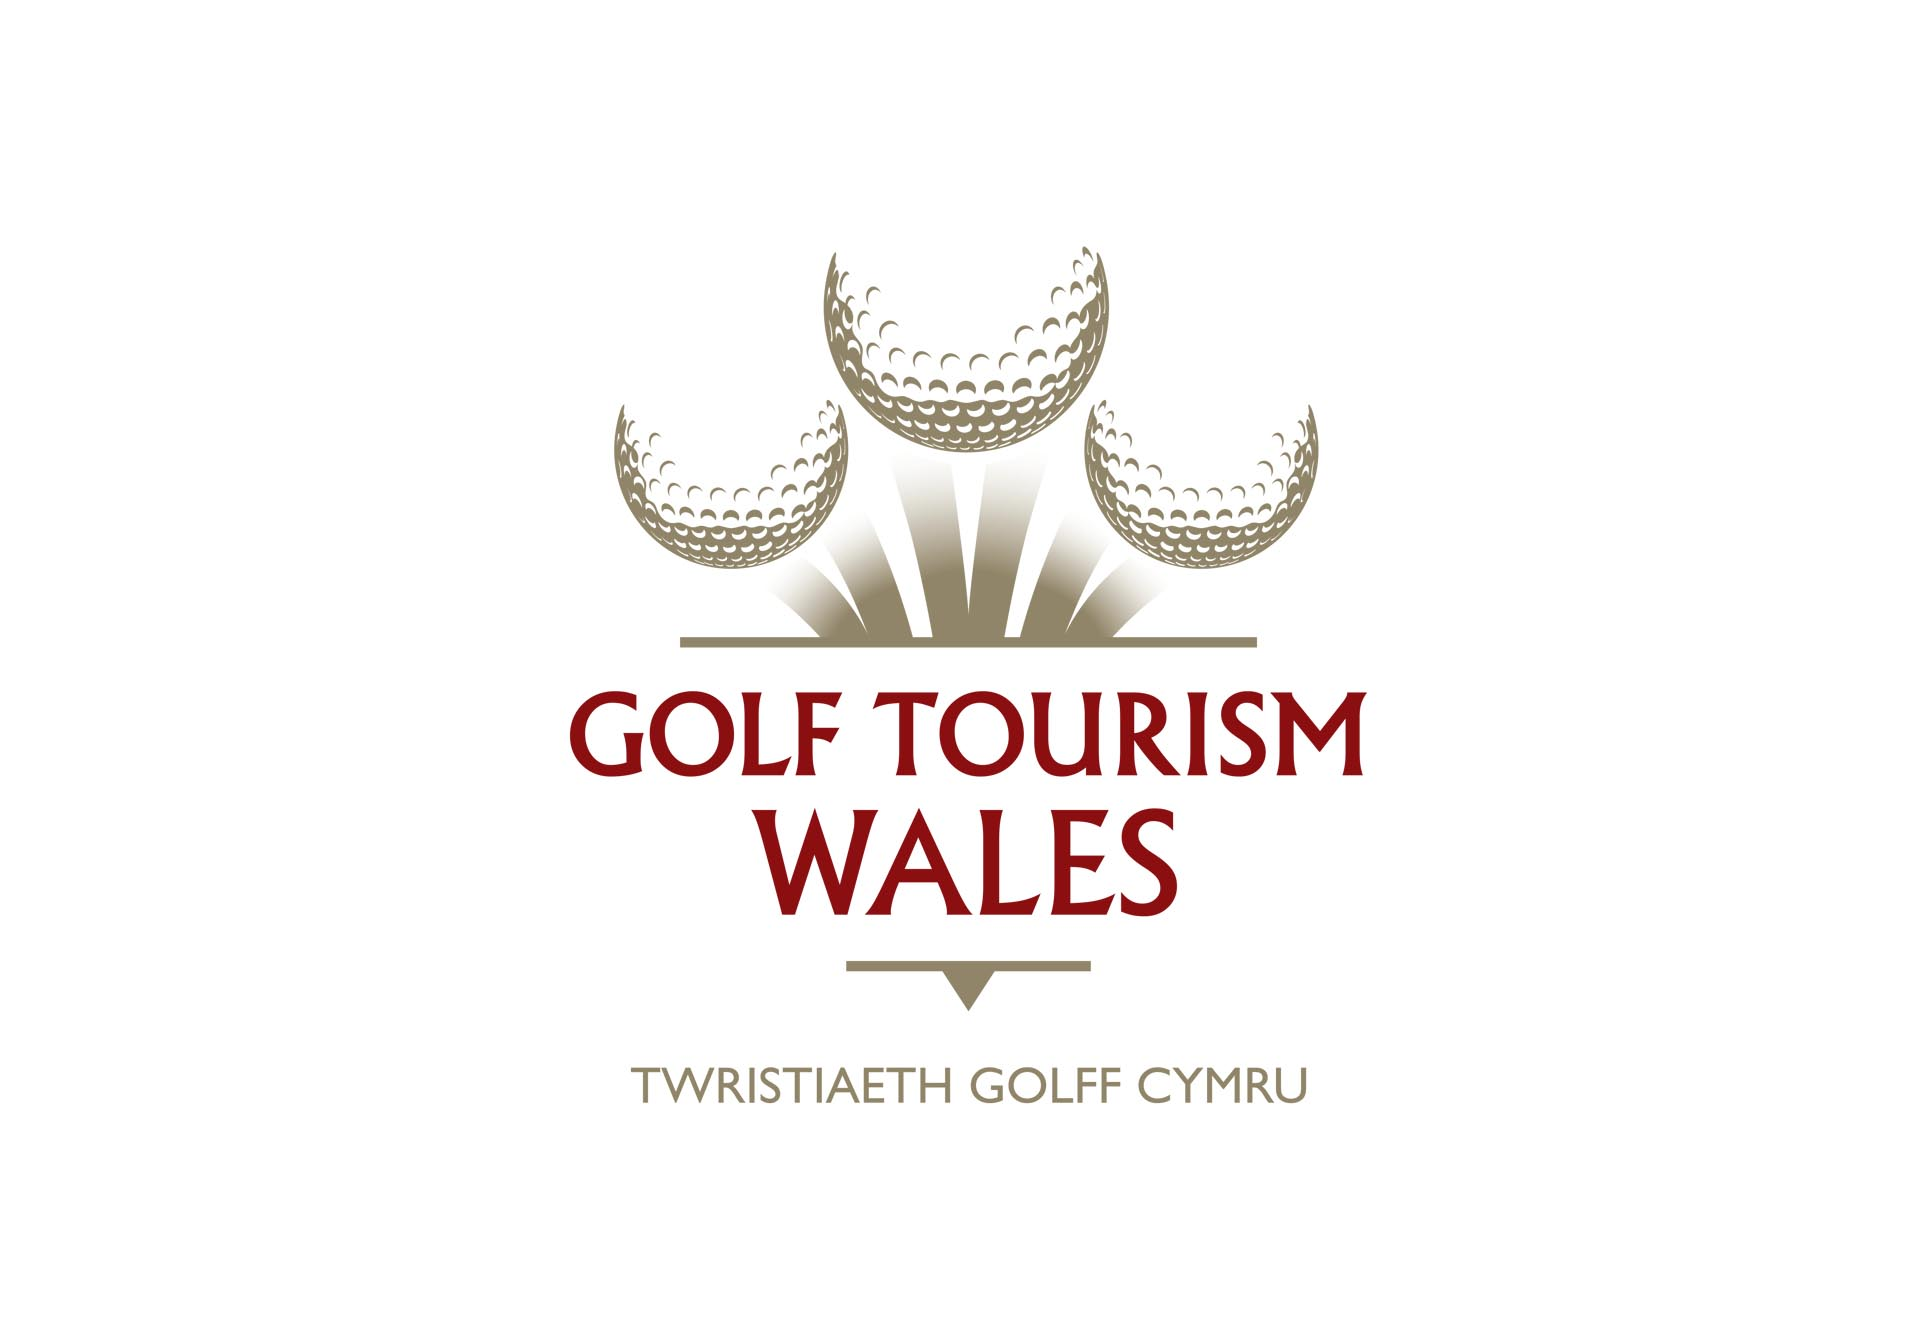 Golf Tourism Wales